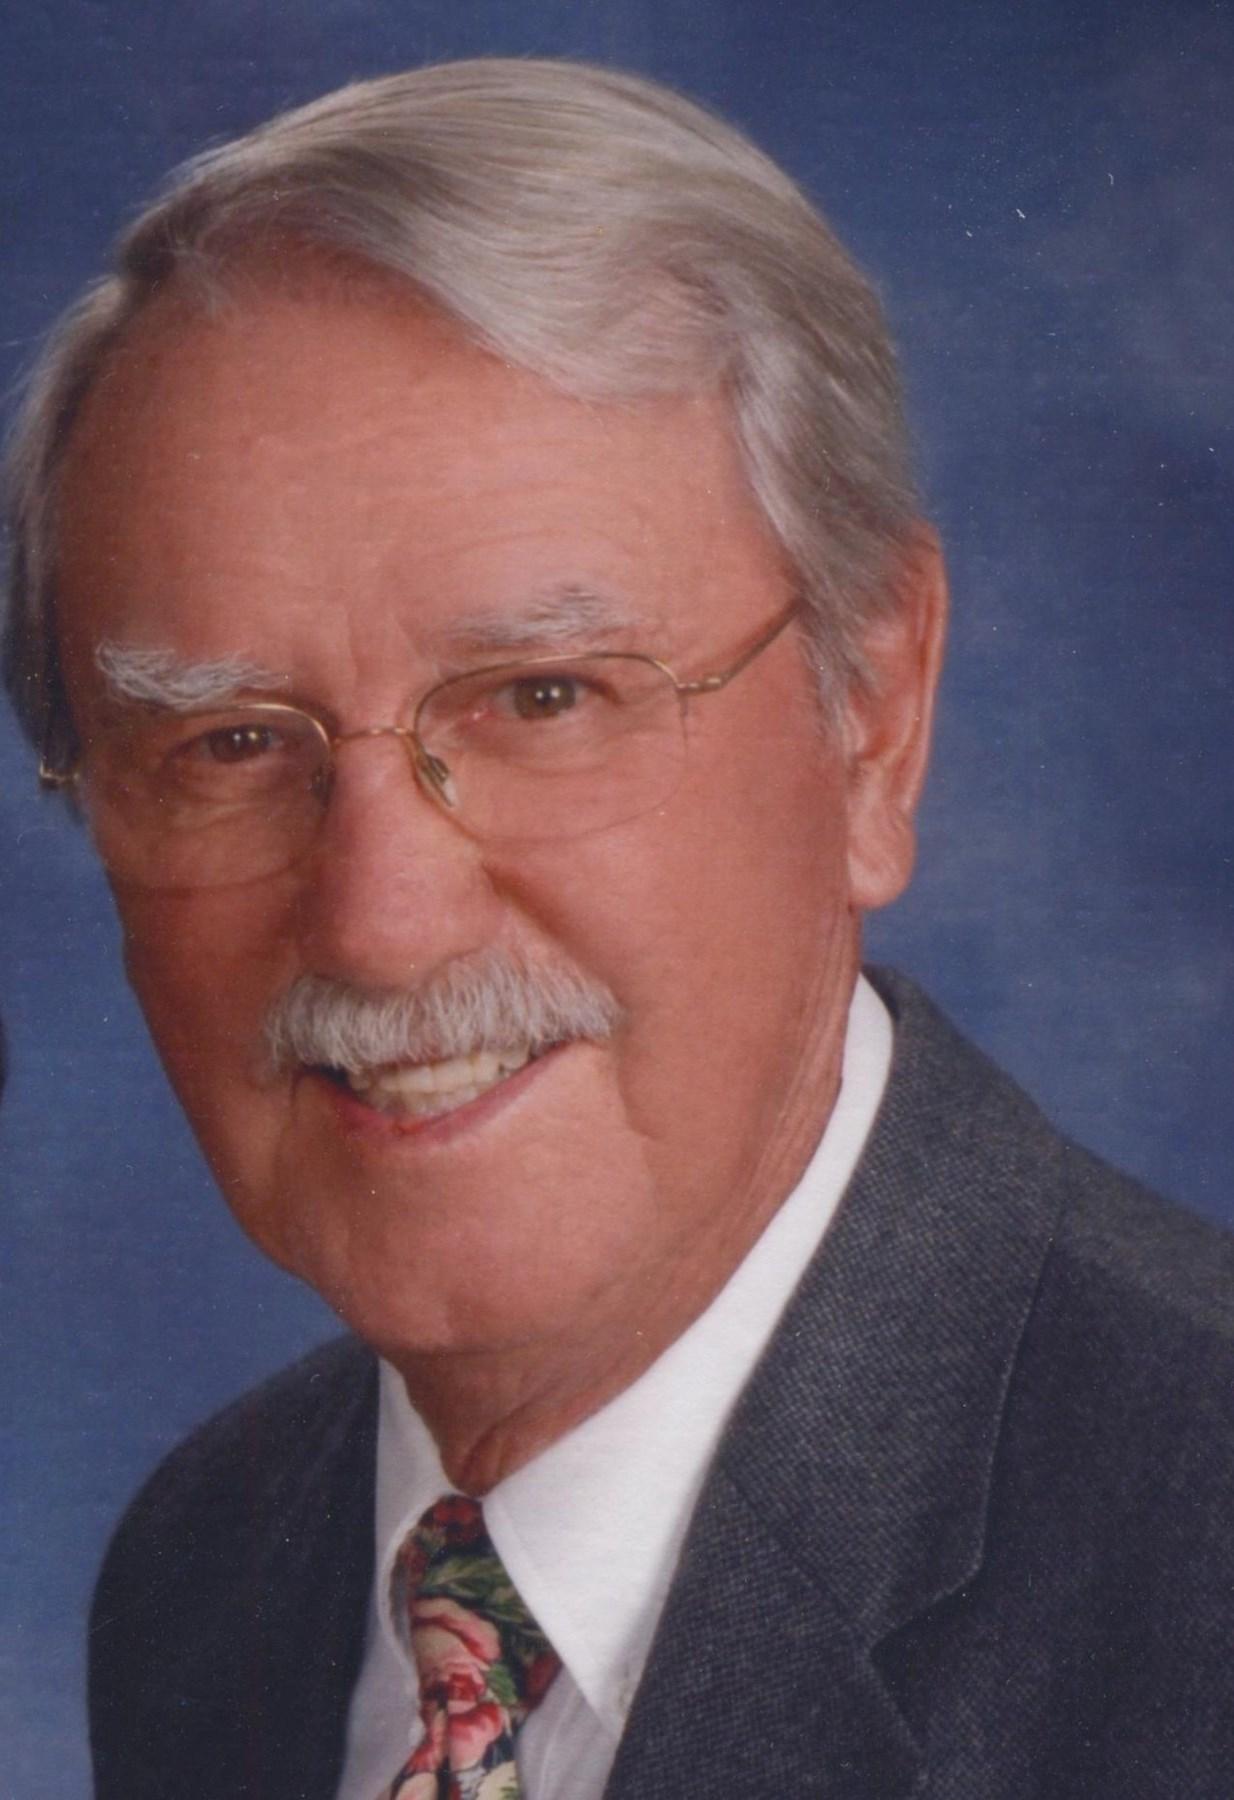 Robert Bob Eugene Marcellus Obituary - Hanford, CA